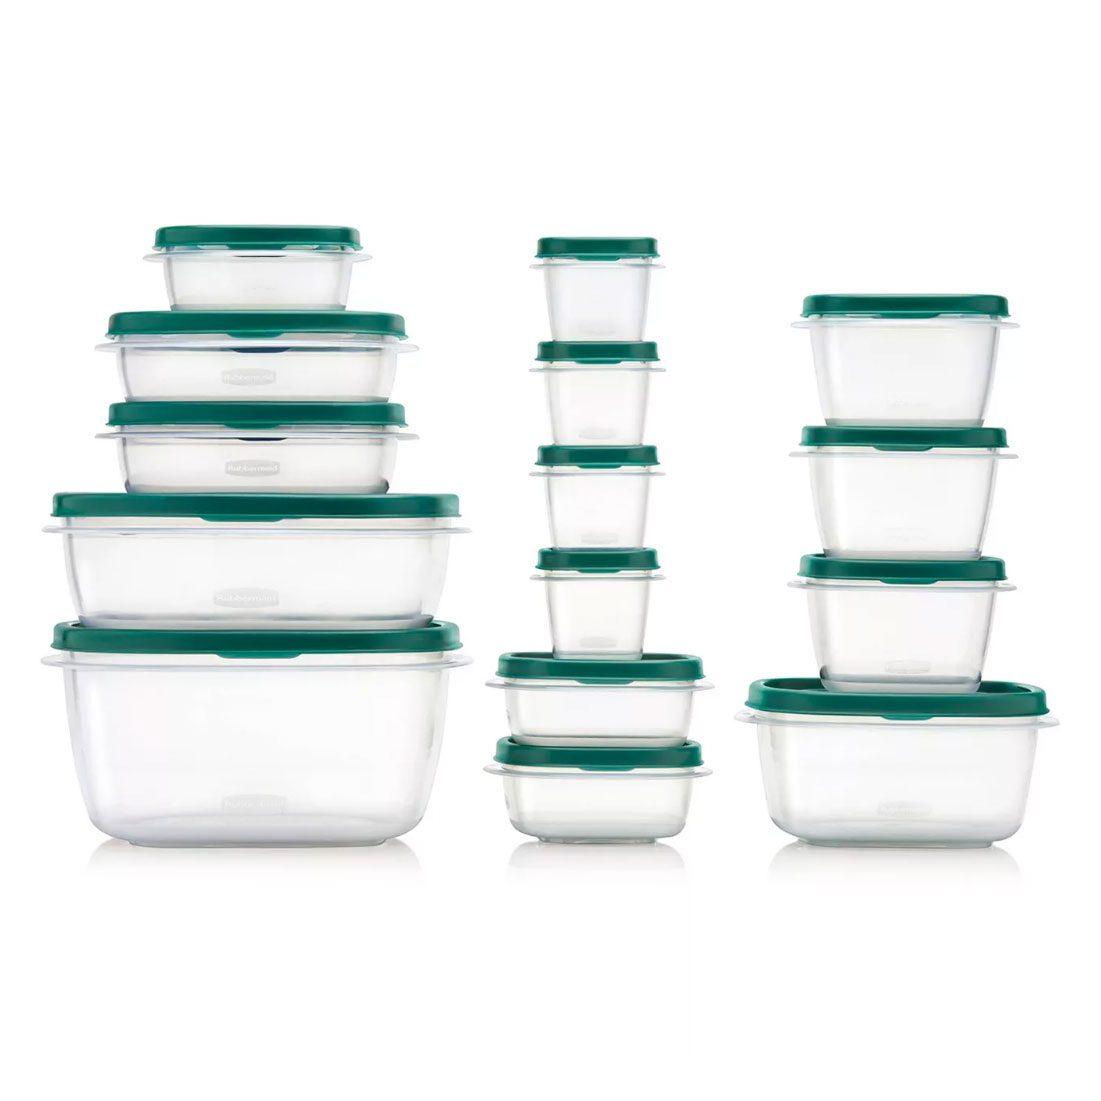 Rubbermaid Storage Container Set